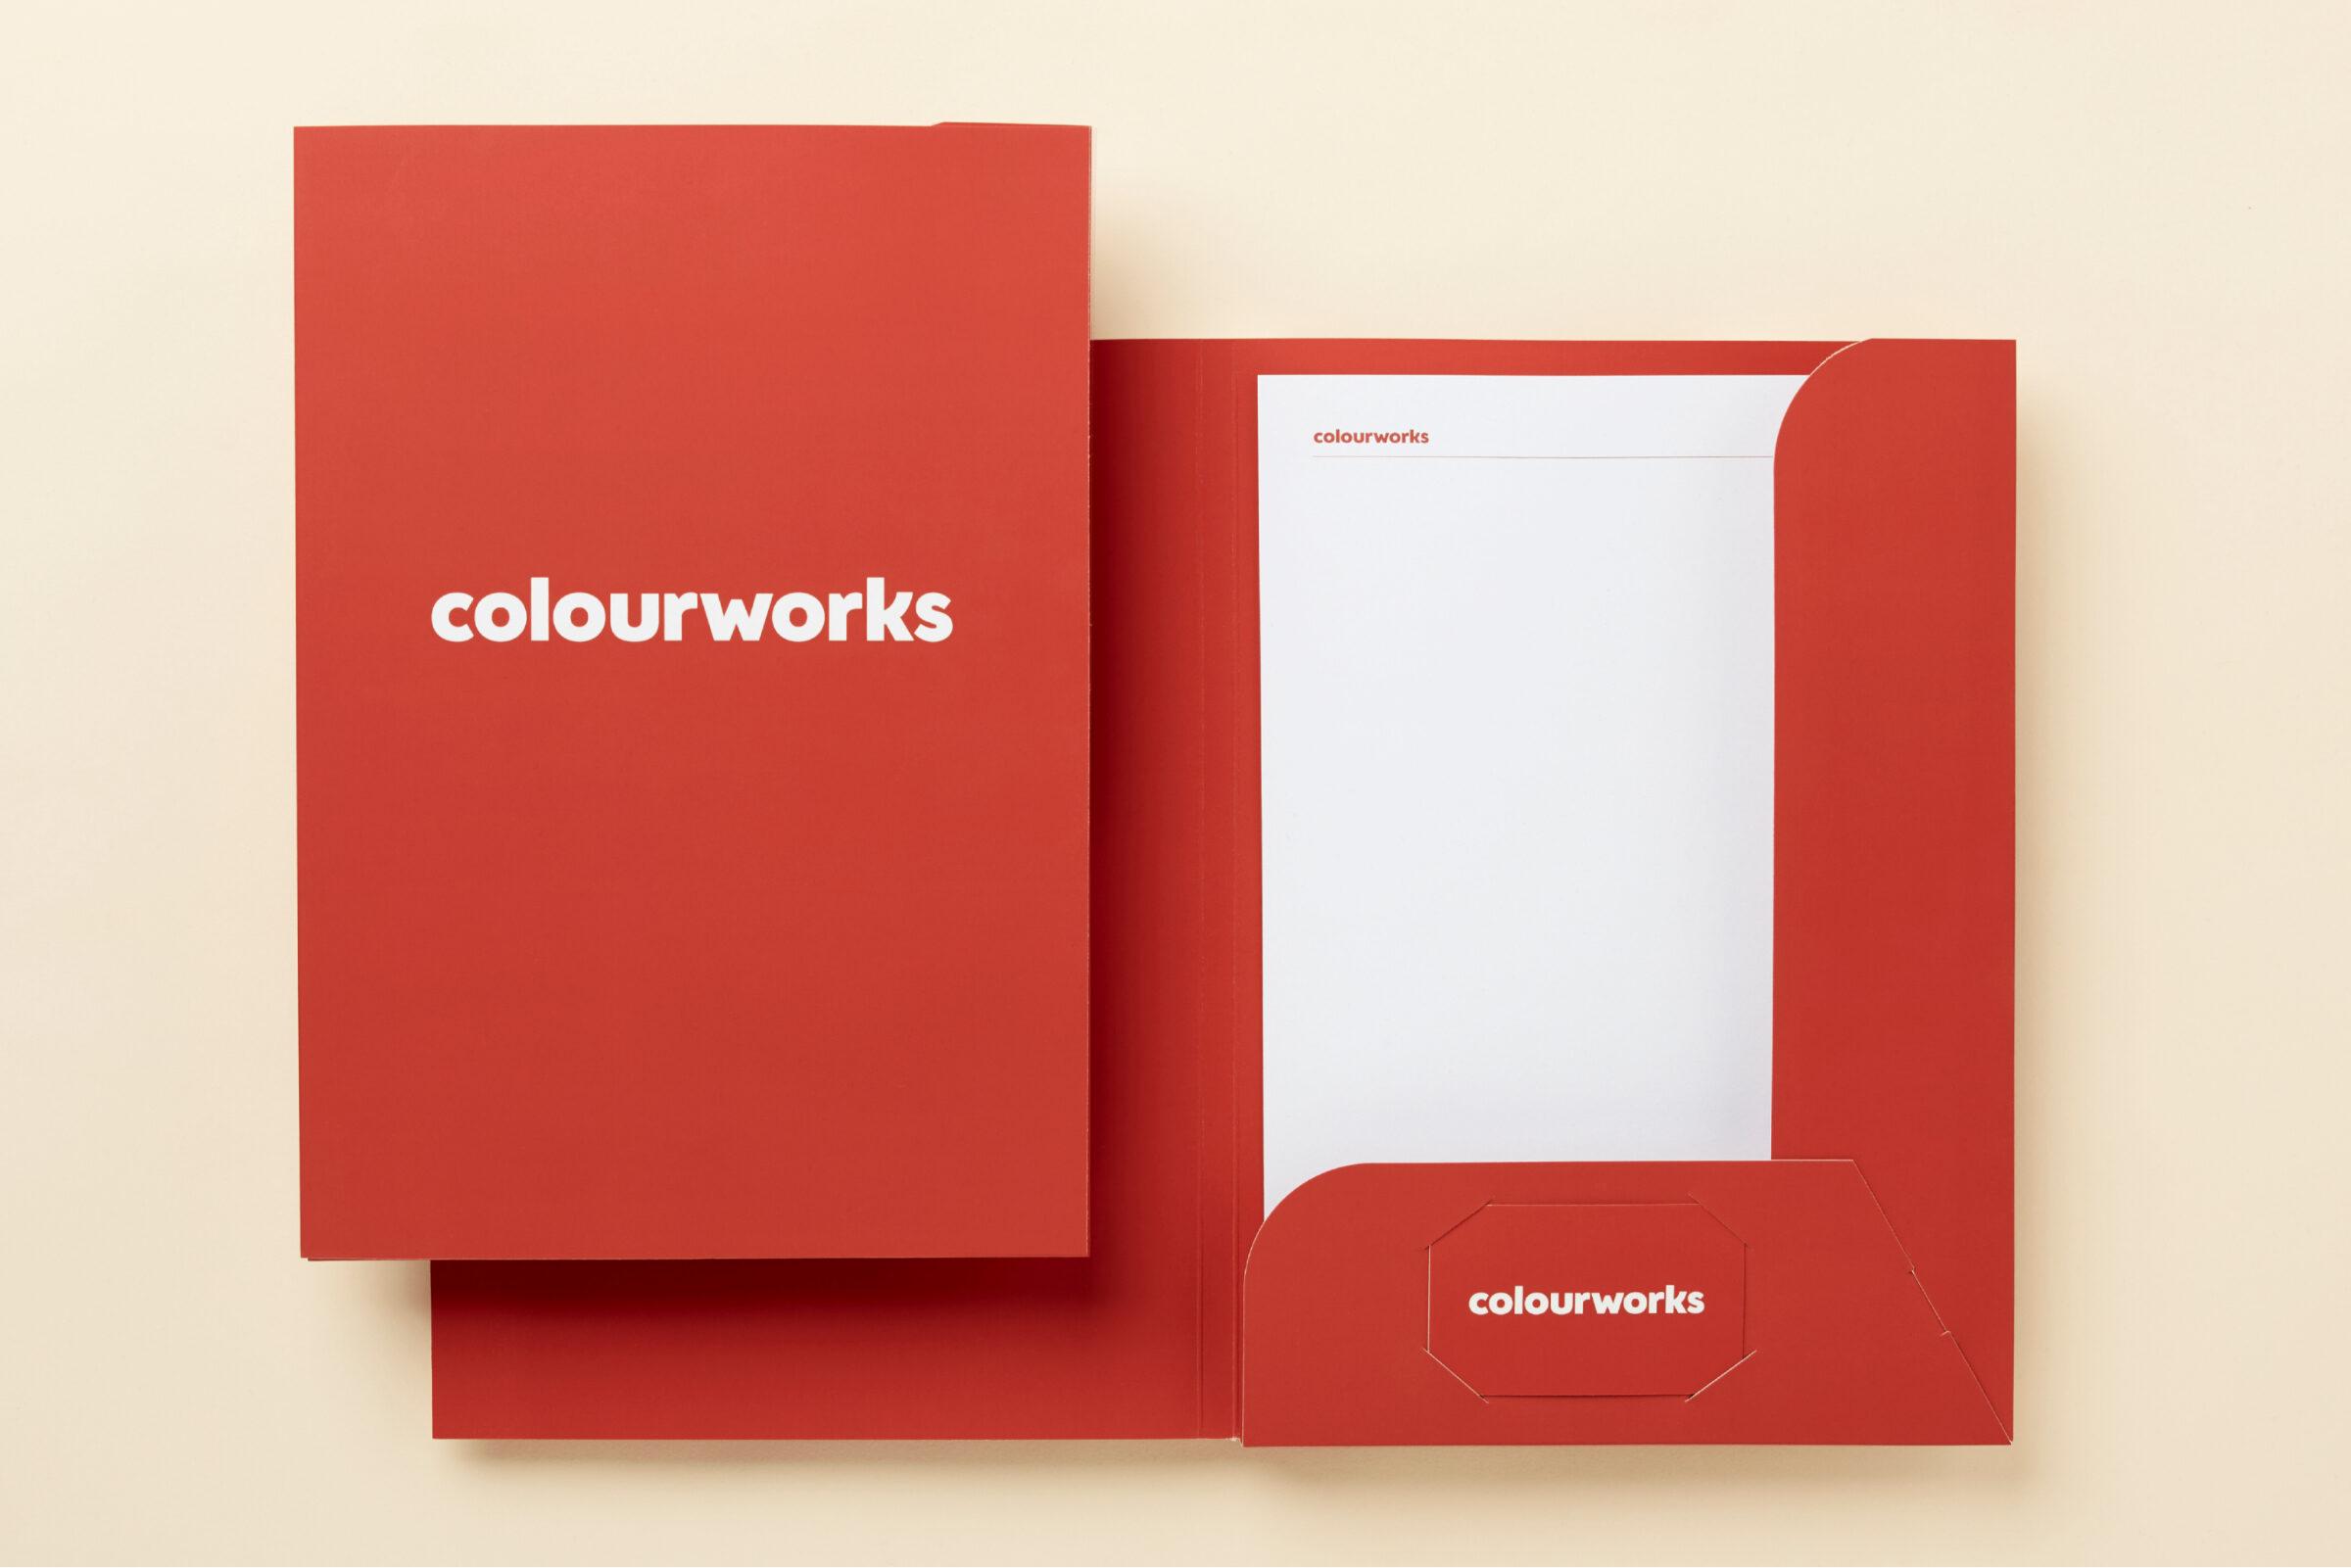 Headjam folio colourworks 005